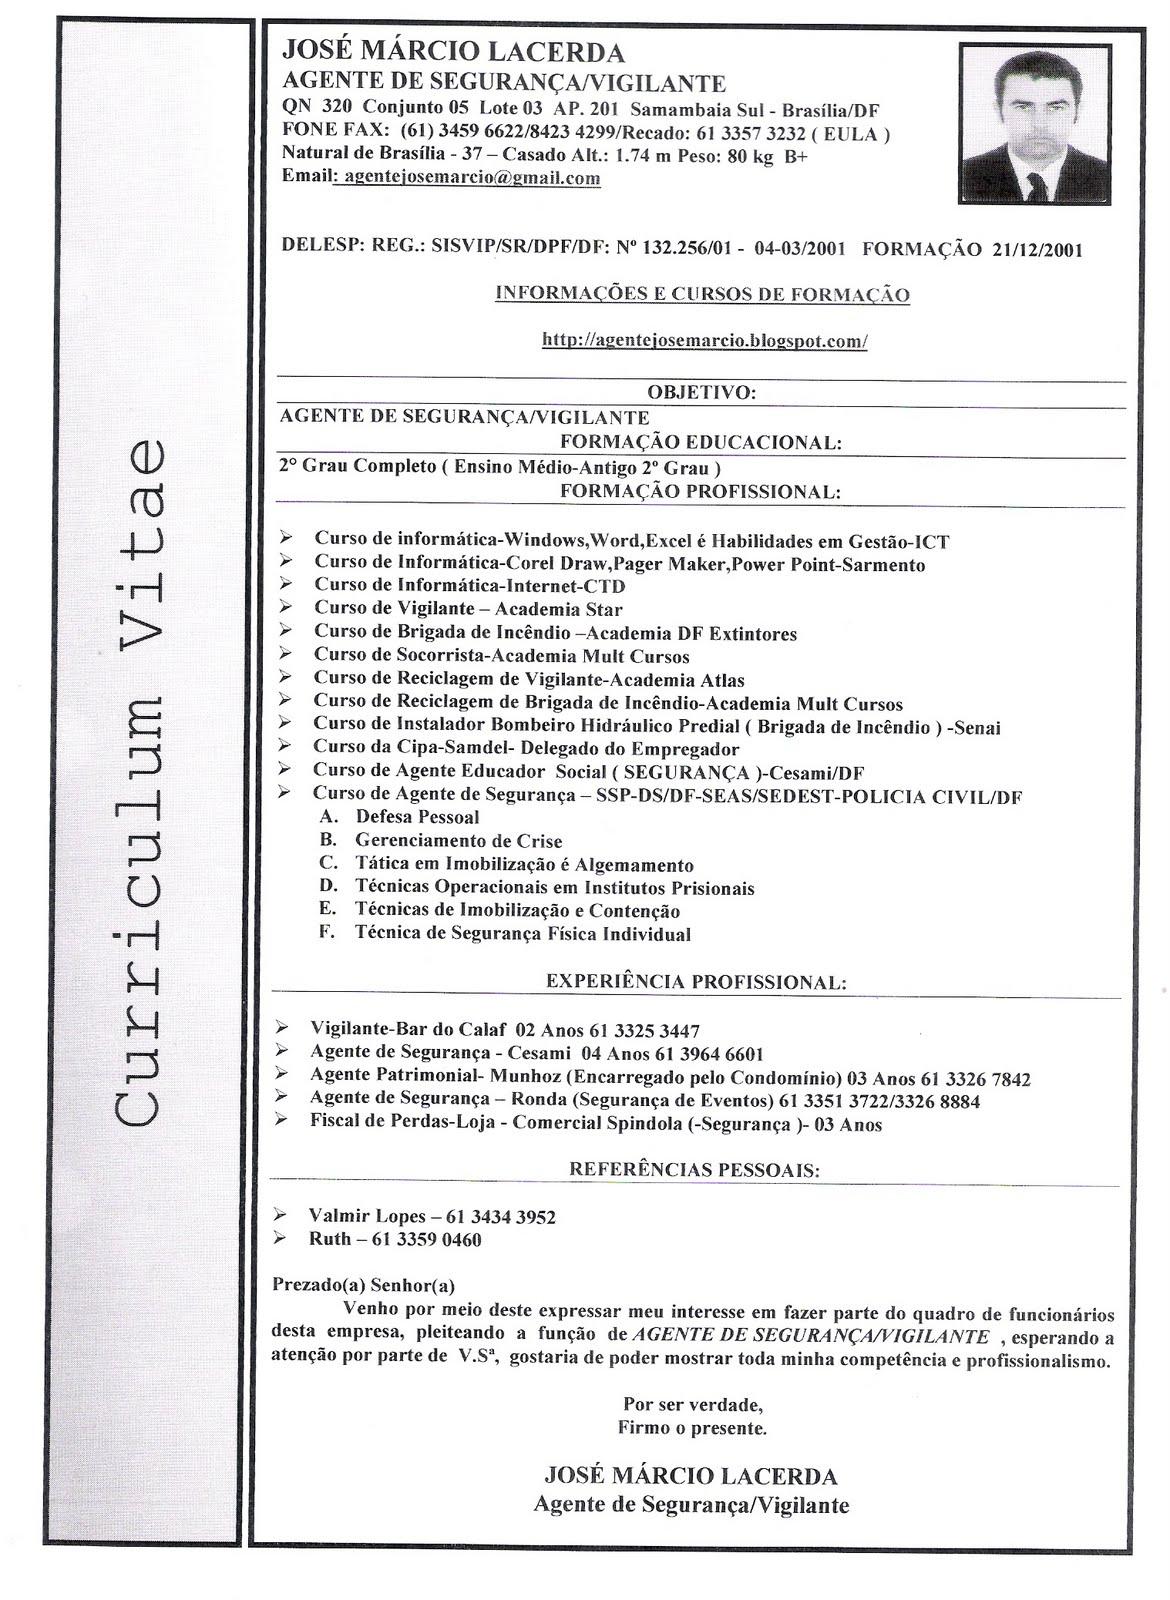 Curriculum Vitae Modelo Brasileiro Download